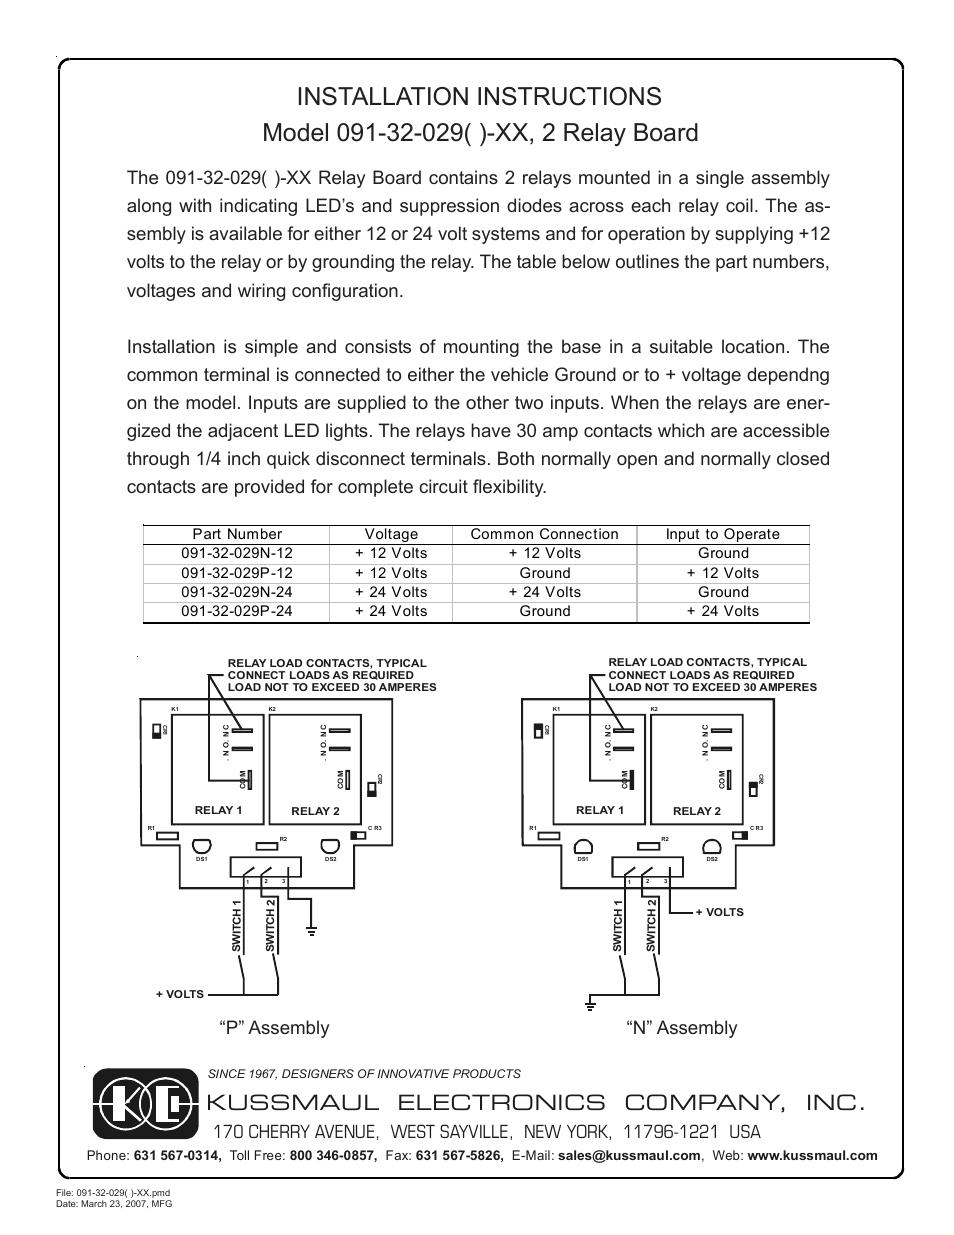 Kussmaul Electronics 091 32 029 User Manual 1 Page 24 Volt Led Wiring Diagram